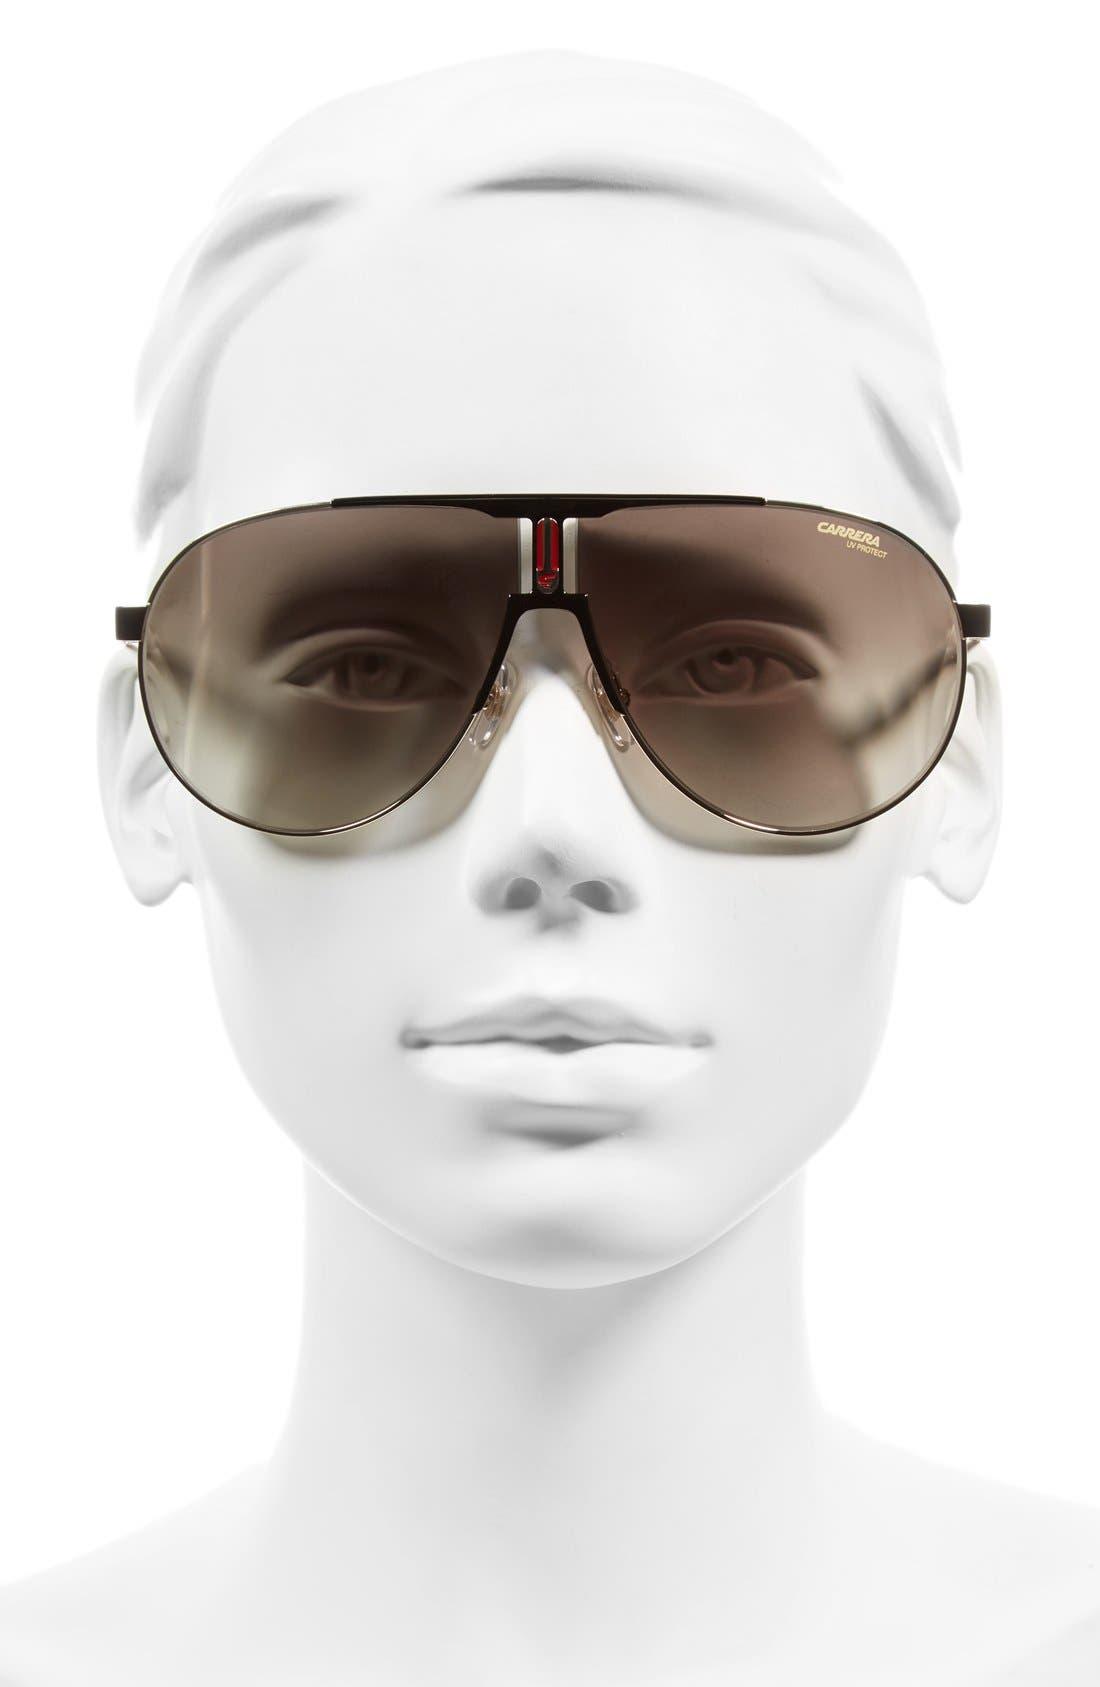 66mm Aviator Sunglasses,                             Alternate thumbnail 2, color,                             Black Gold